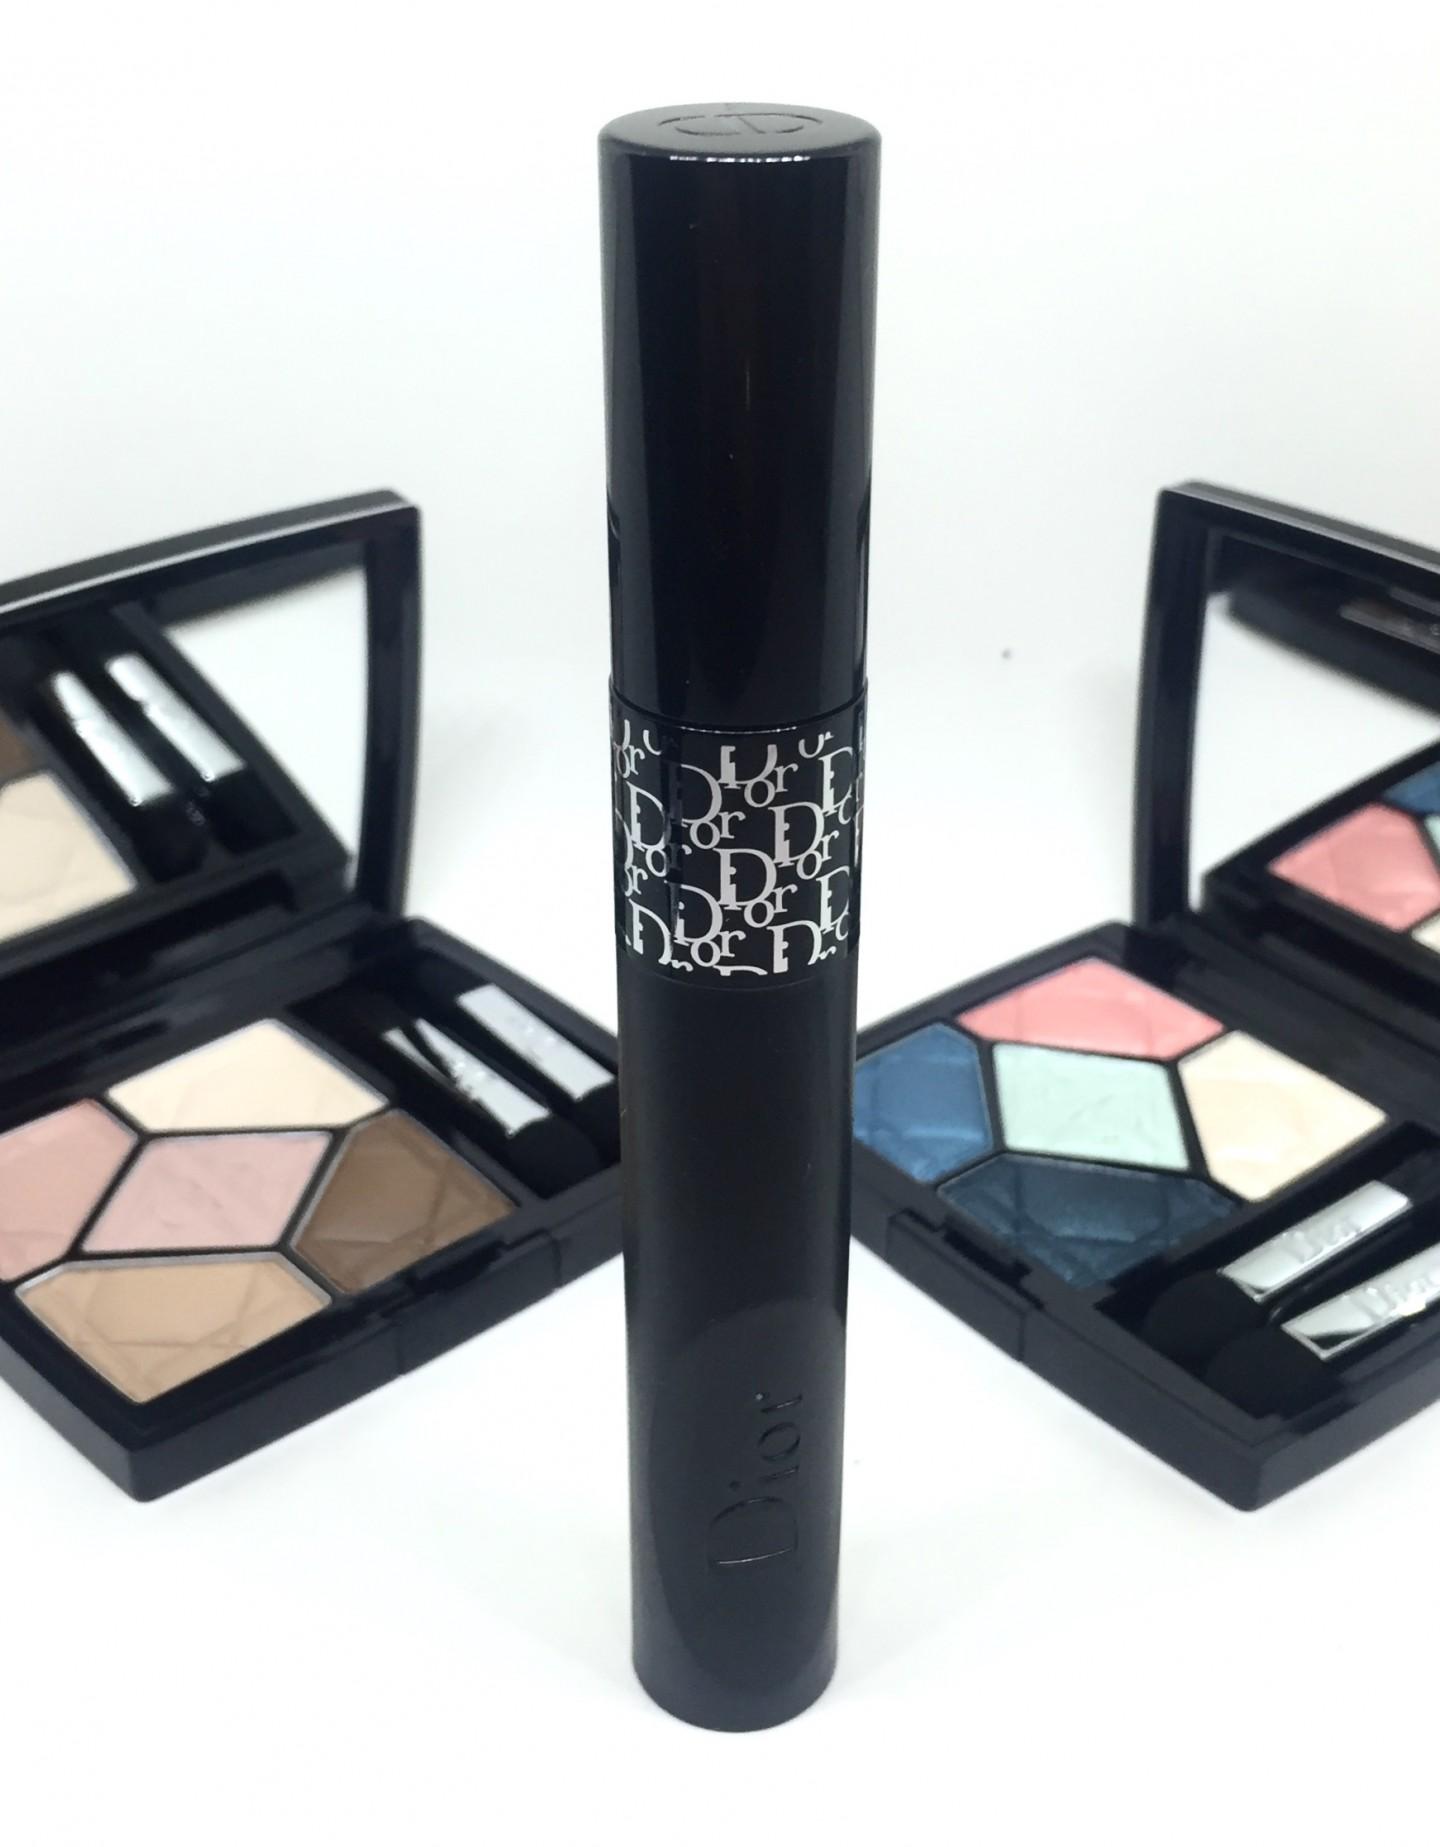 Diorshow Pump N Volume Mascara & 5 Couleurs Eyeshadow Palettes